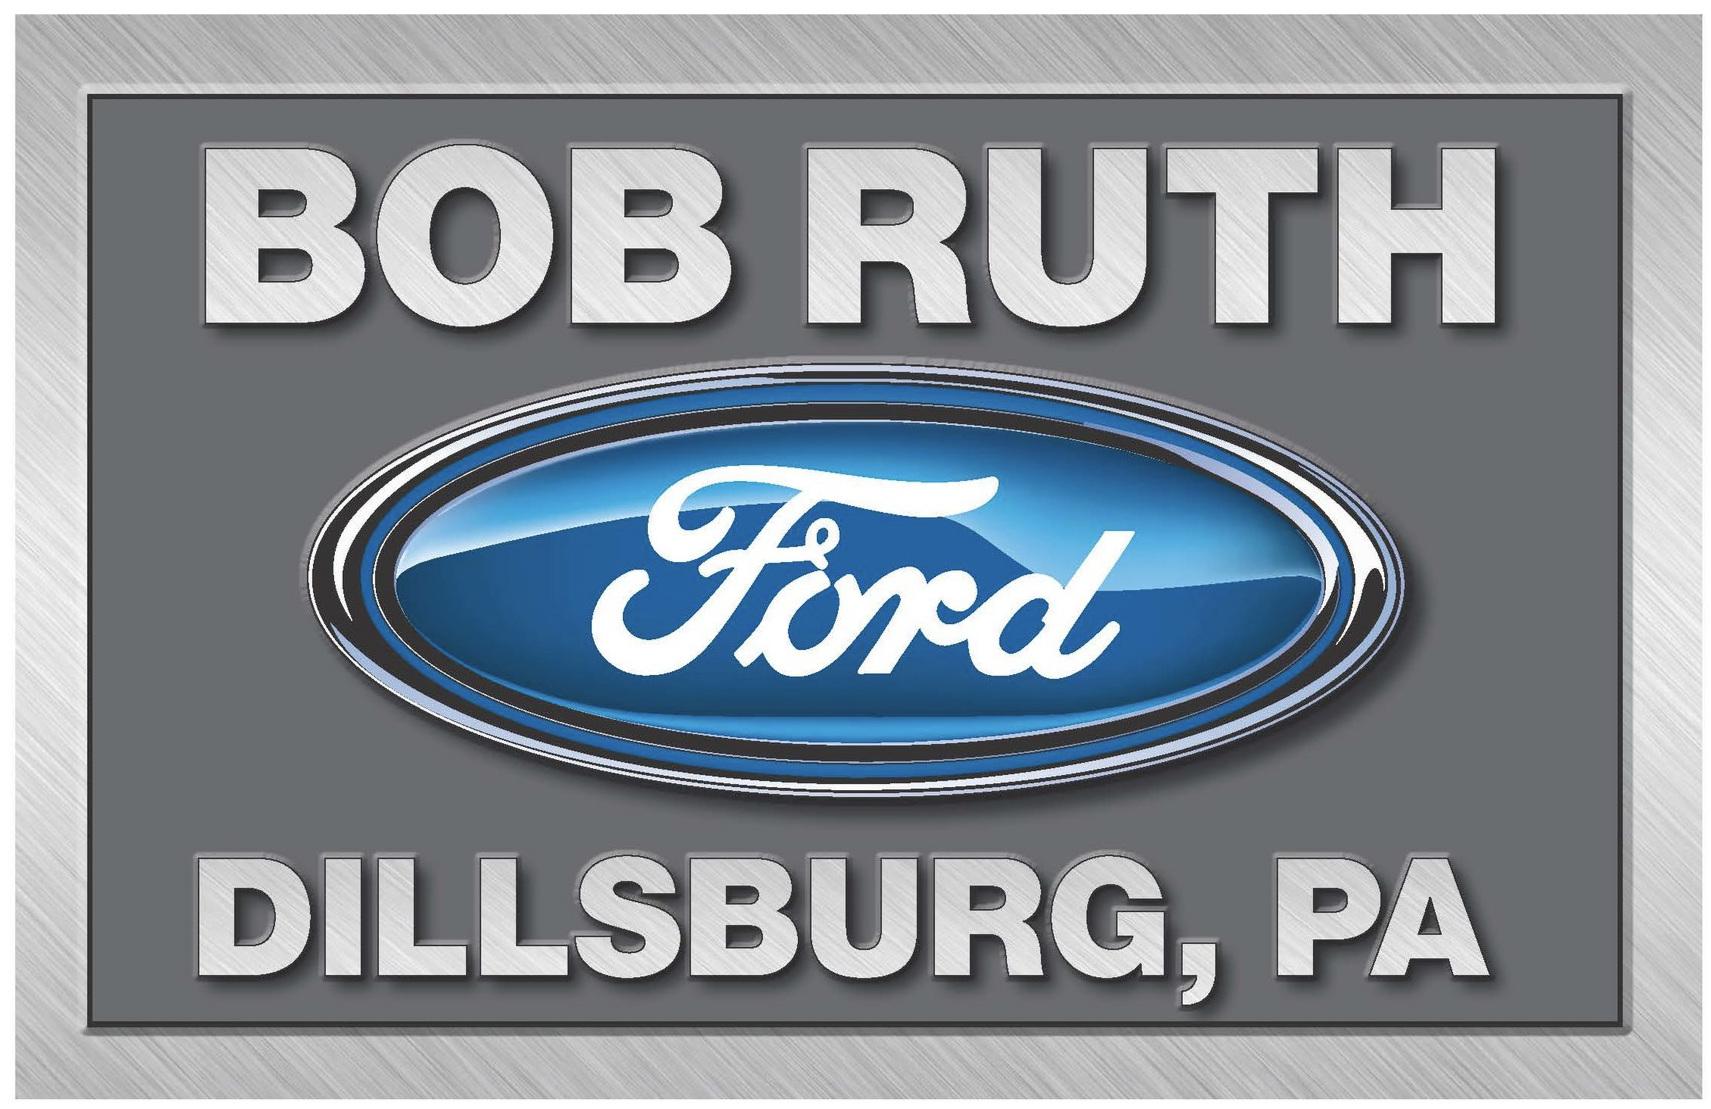 Bob+Ruth+Ford+Stamped+Logo+%28HiRes%29.jpg